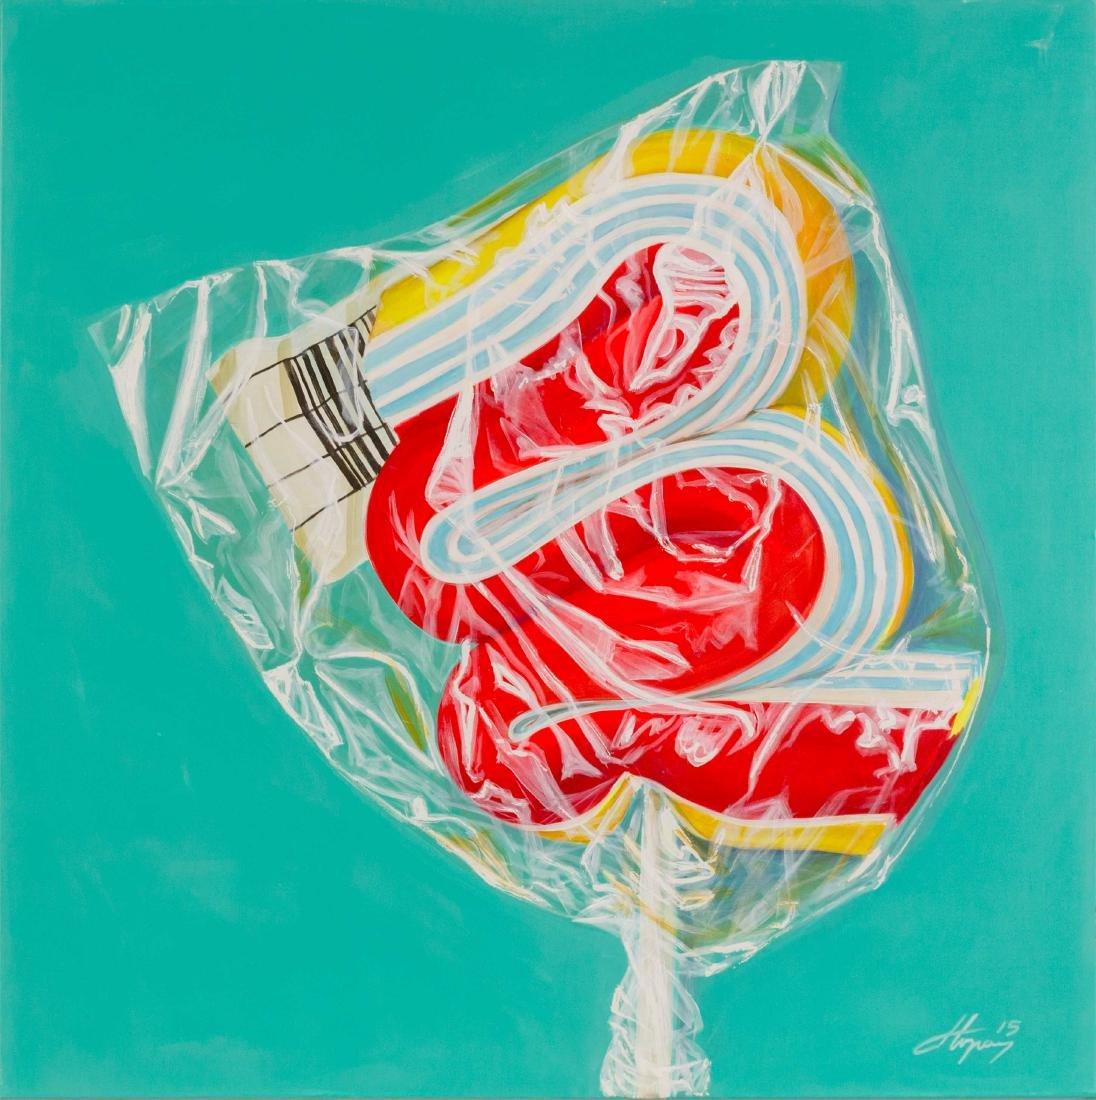 Dorel TOPAN (ROM/1963) Big Candy, 2015 Acrylique sur